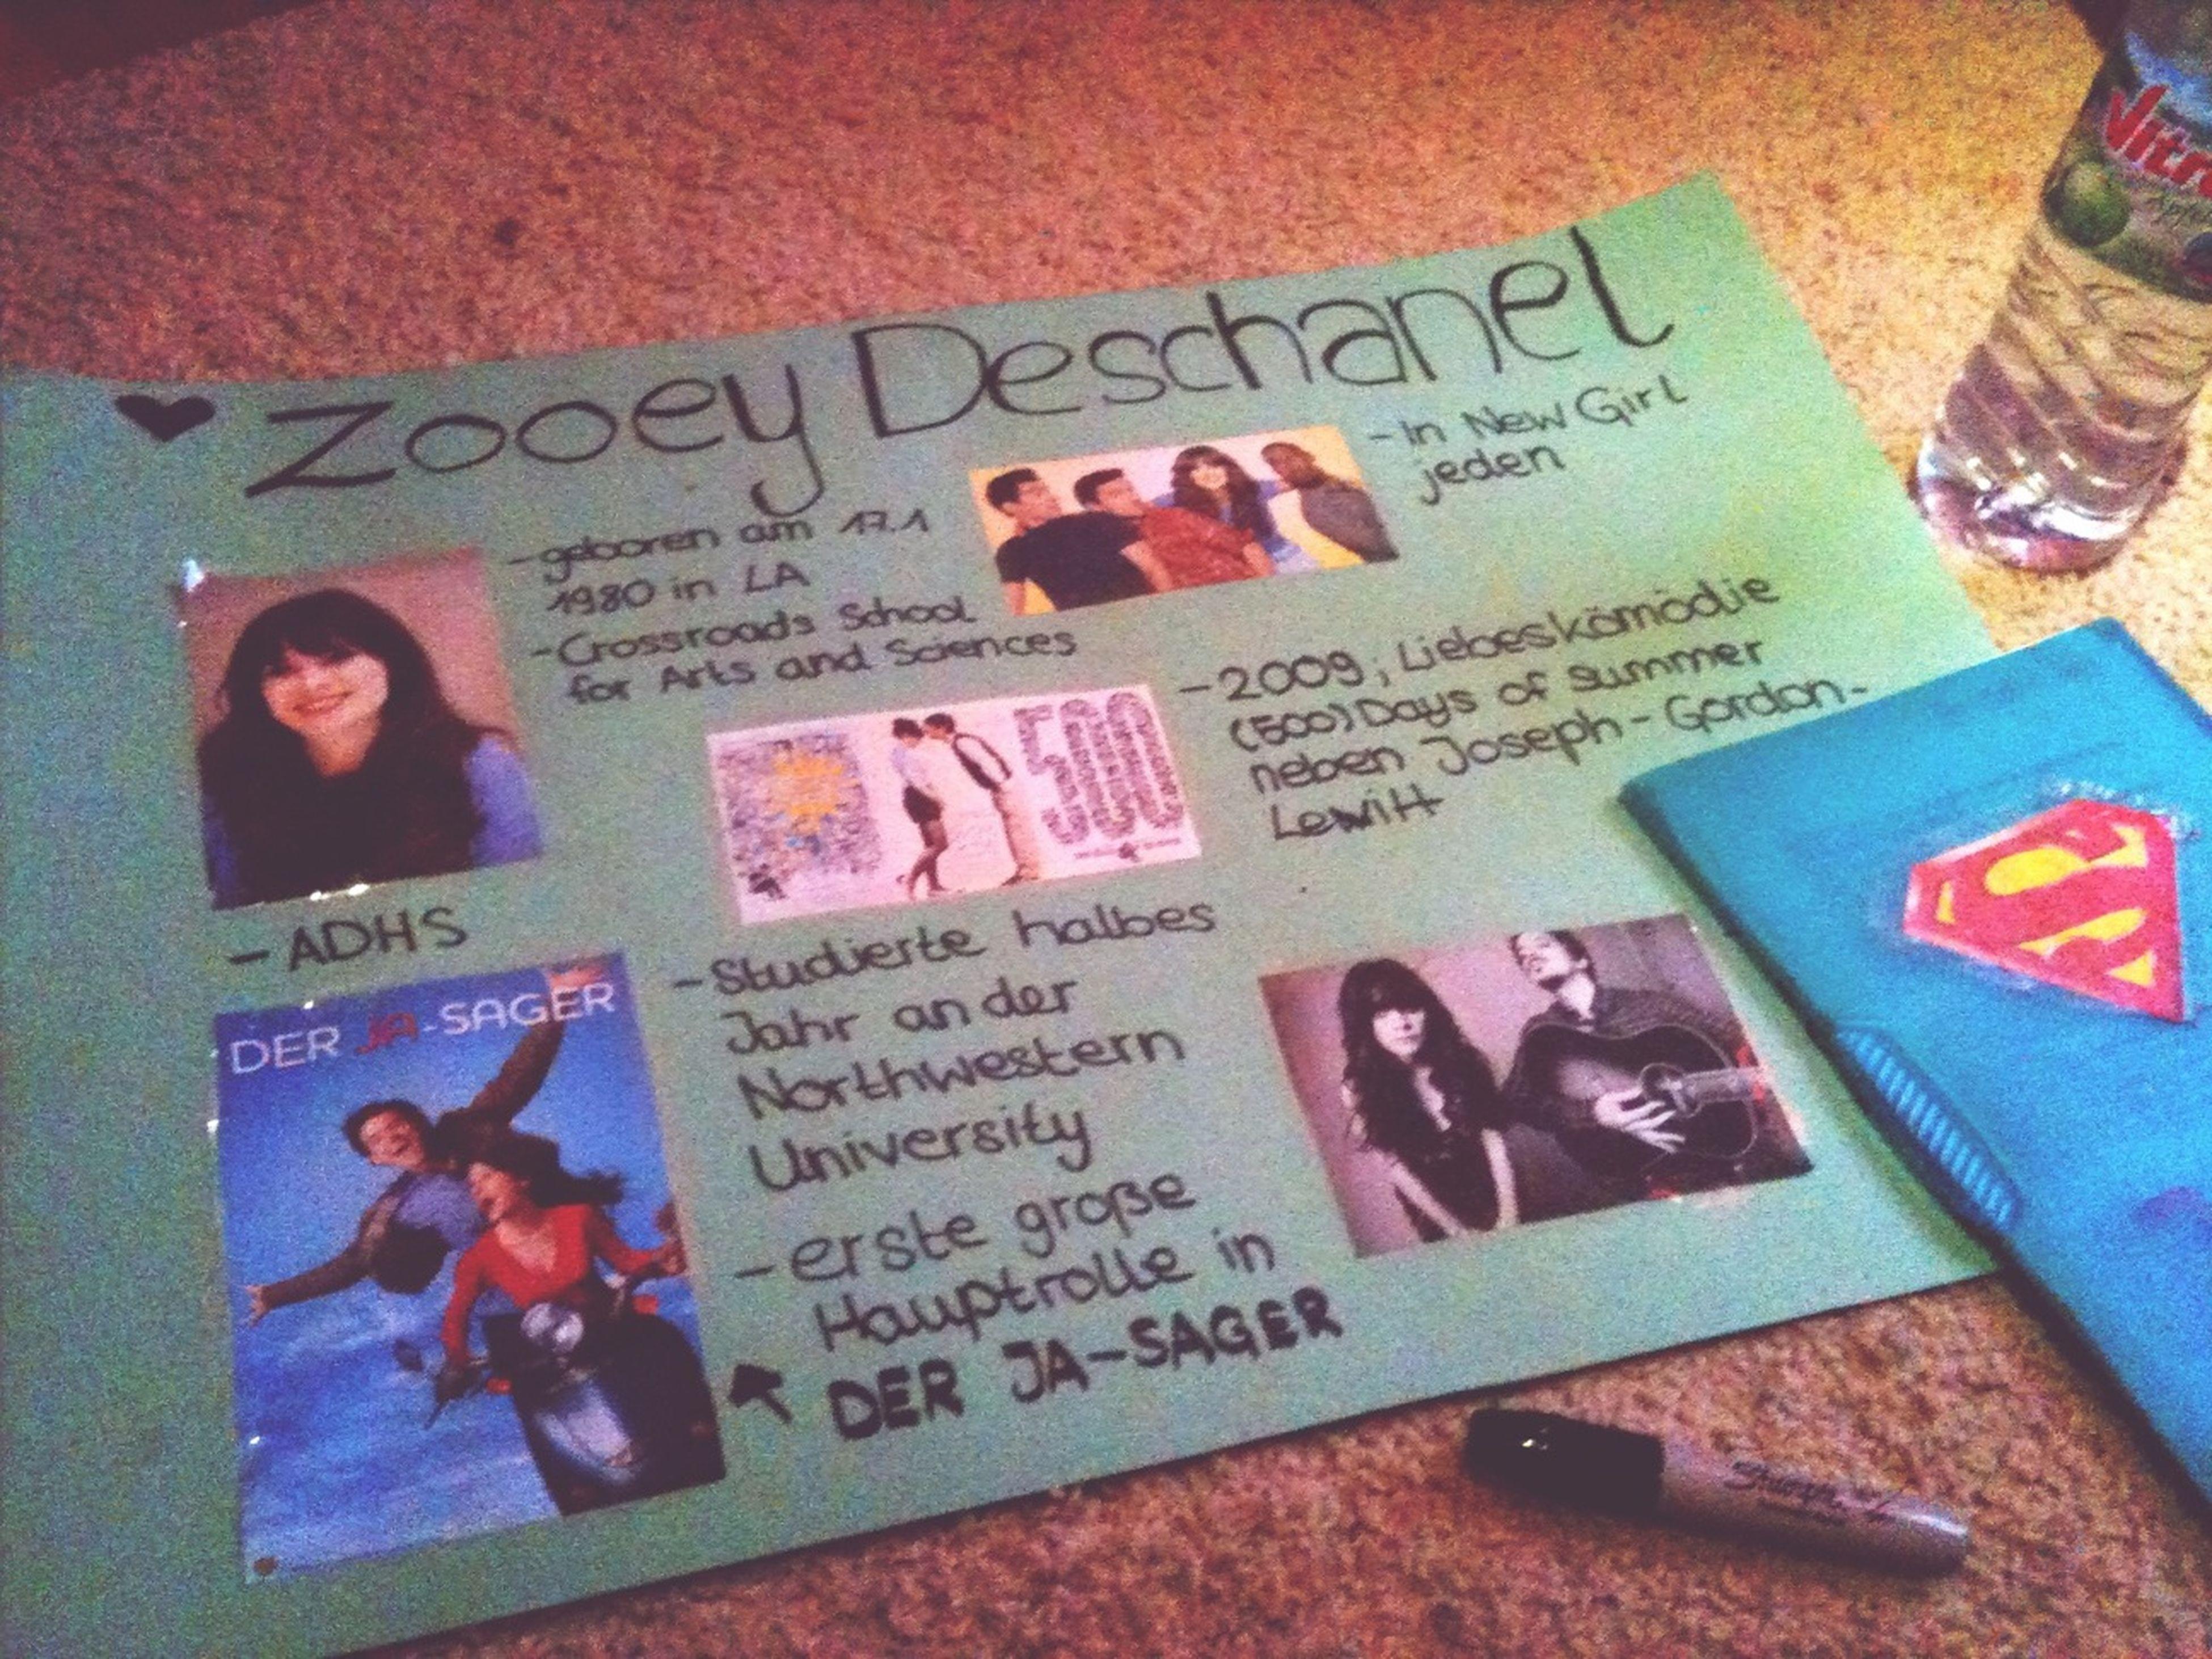 Ready for today ✌ Zooey Deschanel Love